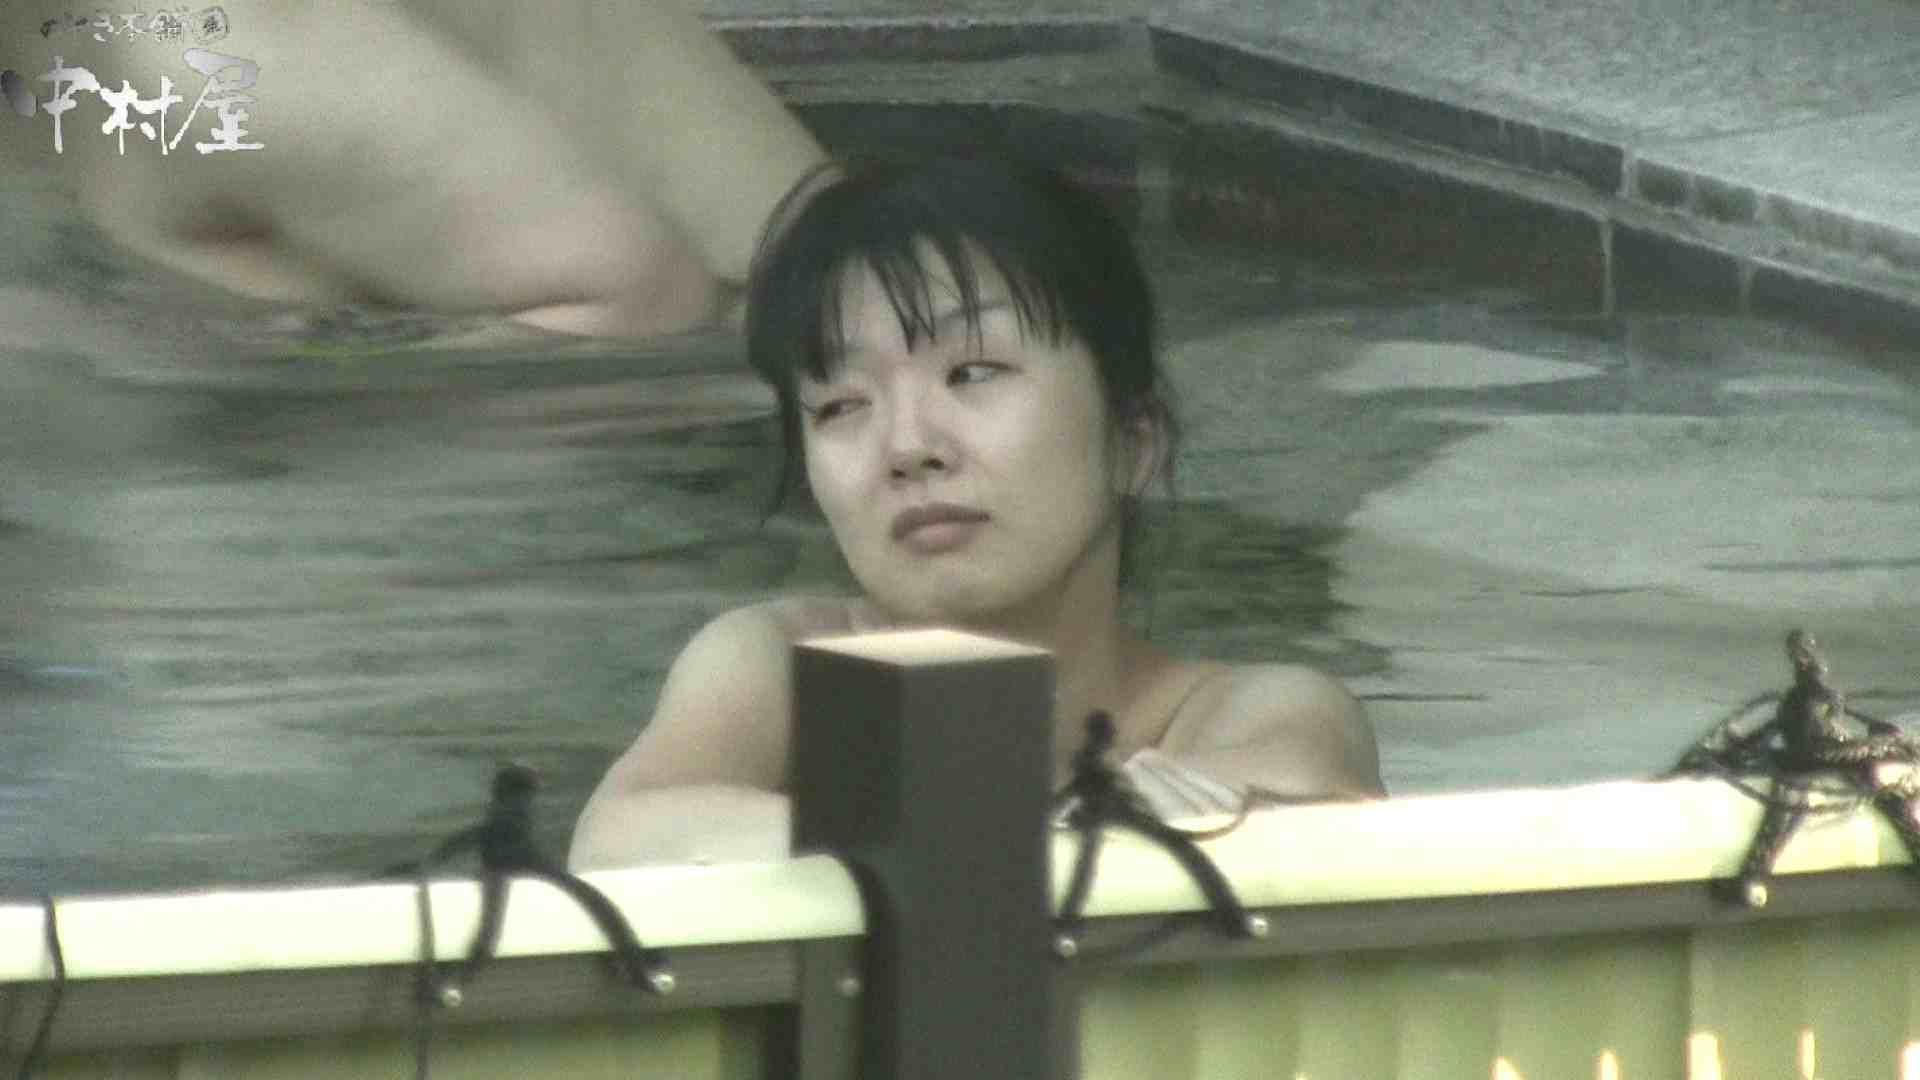 Aquaな露天風呂Vol.904 OL女体 アダルト動画キャプチャ 85連発 32